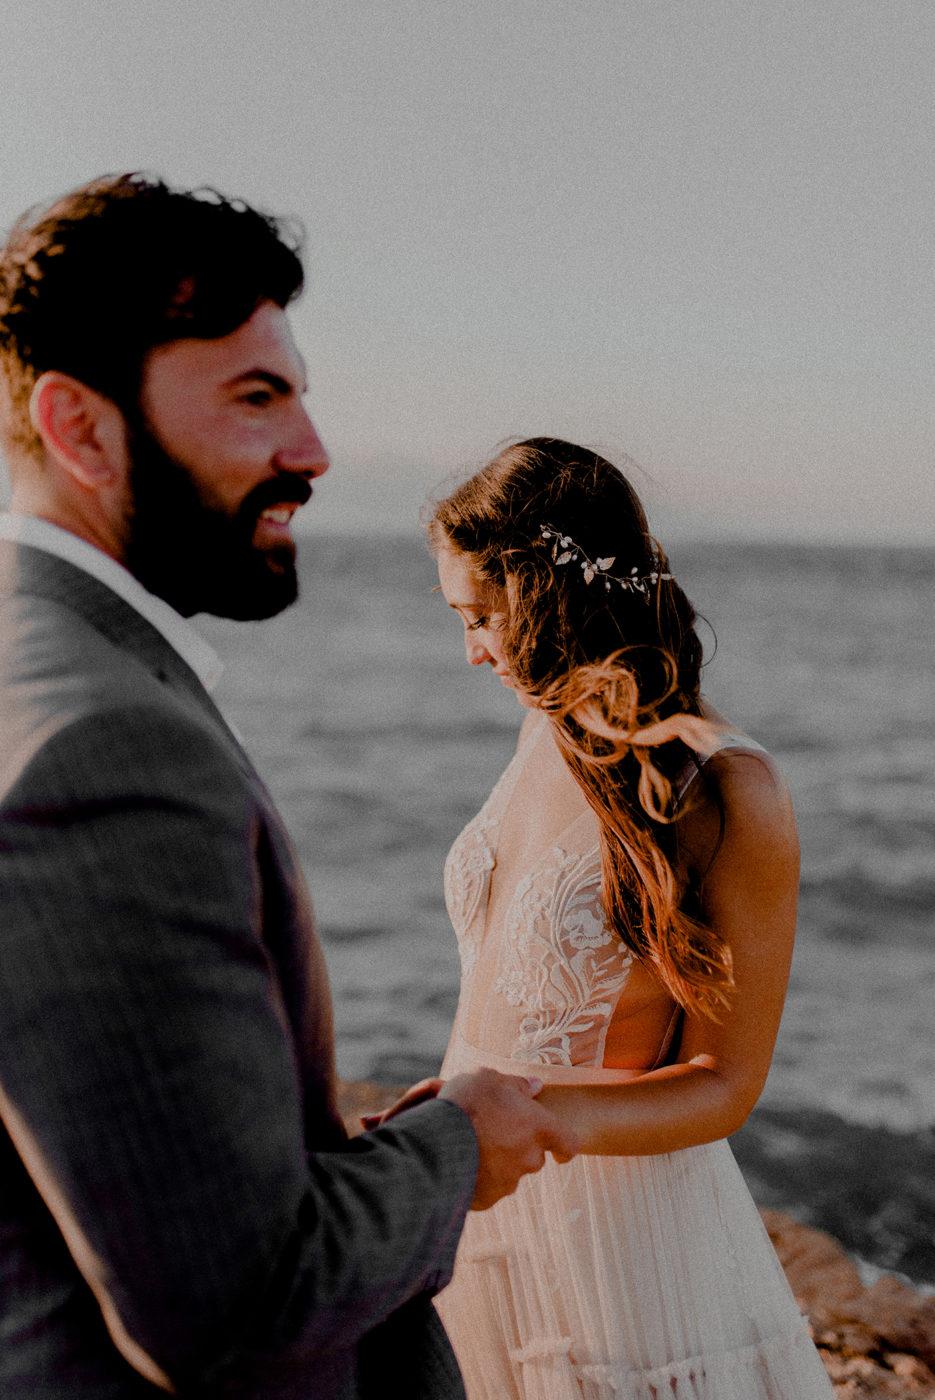 kirill-samarits-wedding-photography-koufonisia-greece-couple-photographer (32)